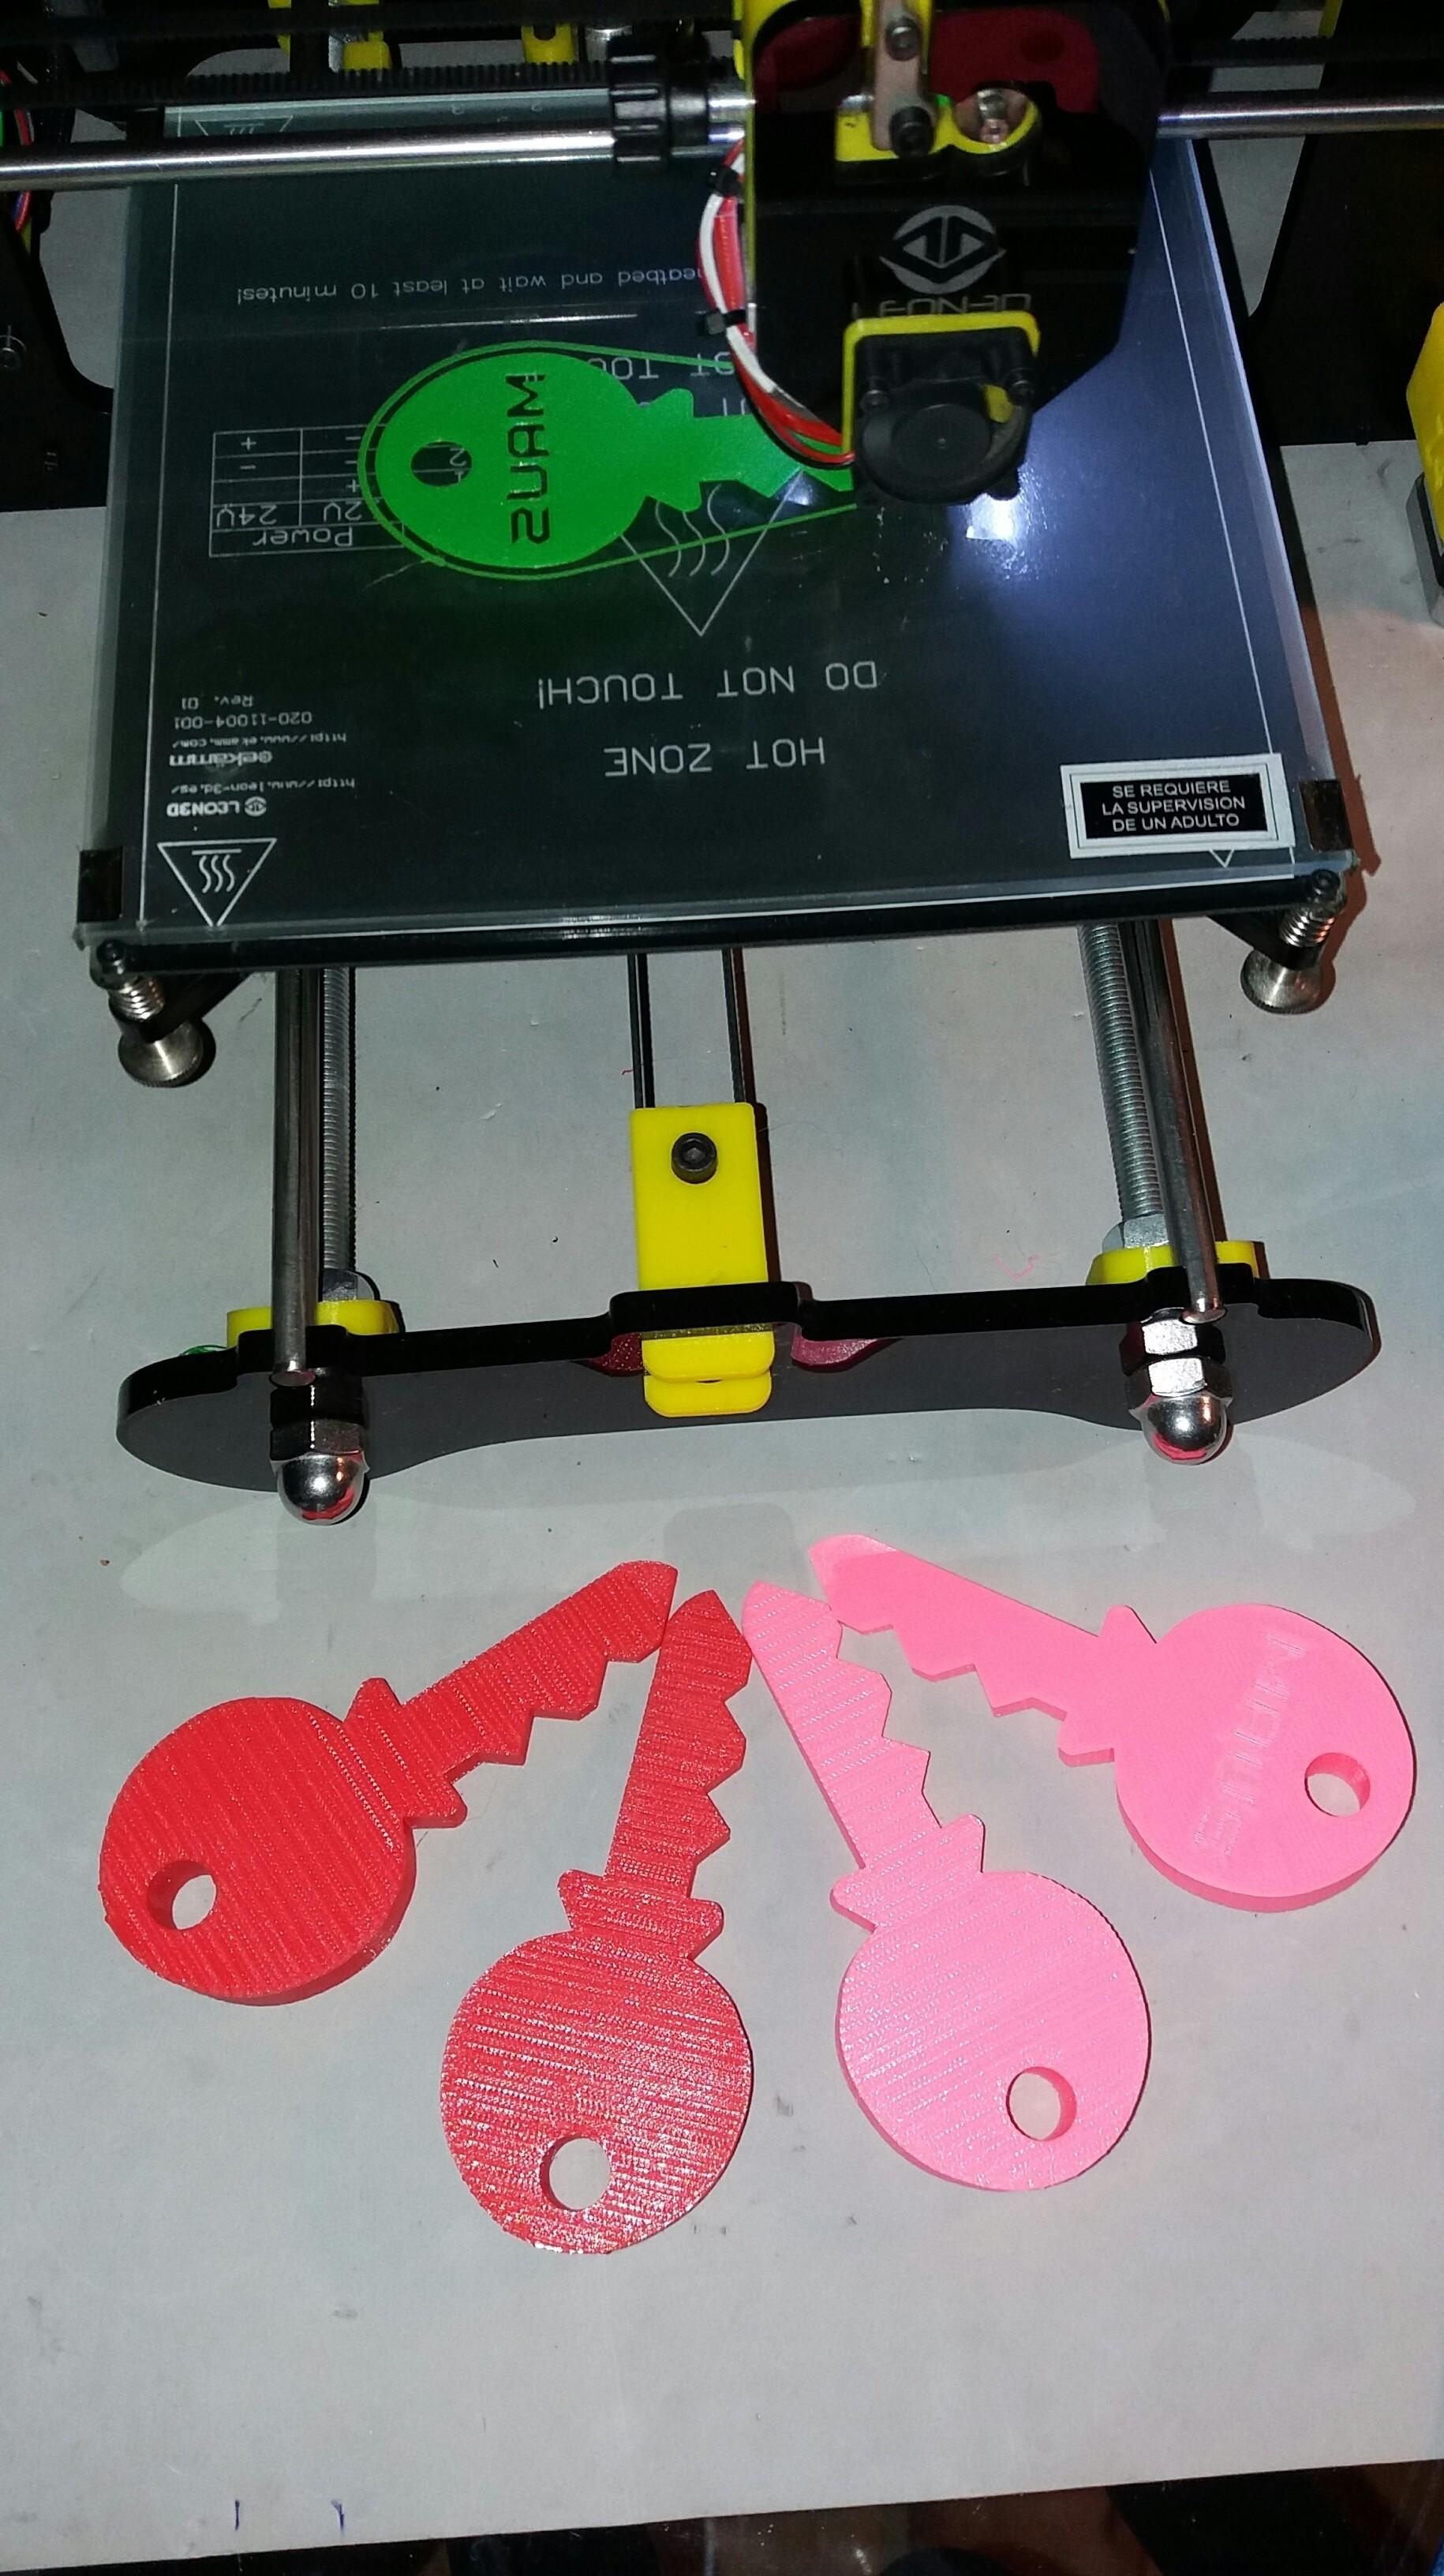 20170604_225207.jpg Download free STL file DOOR_STOP_KEY • 3D printing object, Adolfo